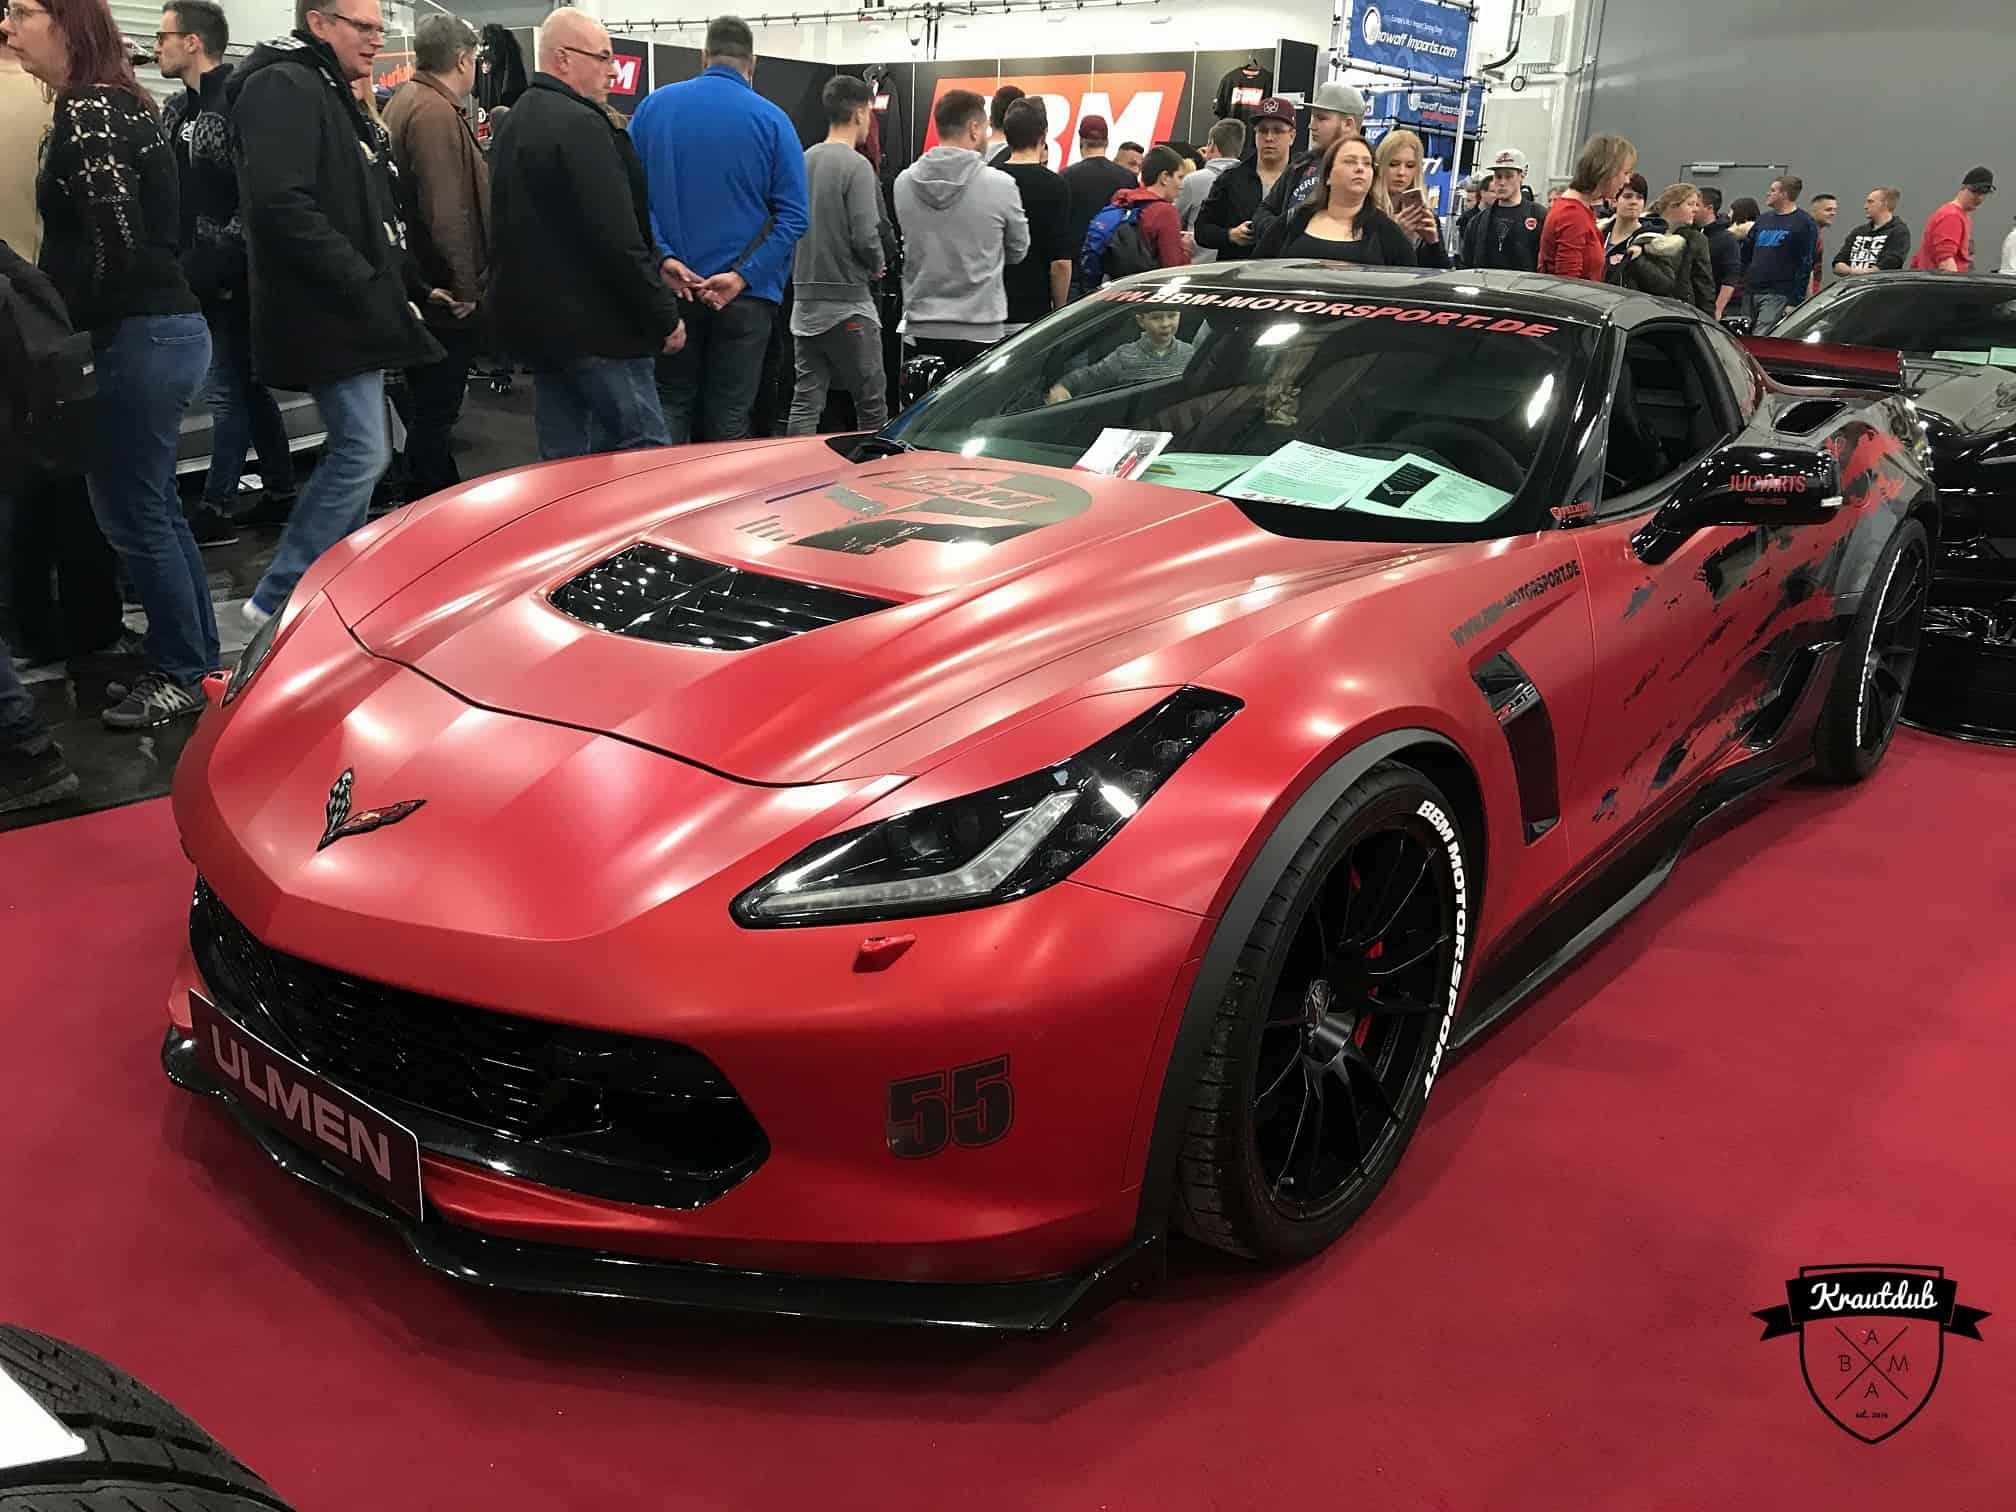 Messe] Essen Motorshow 2017